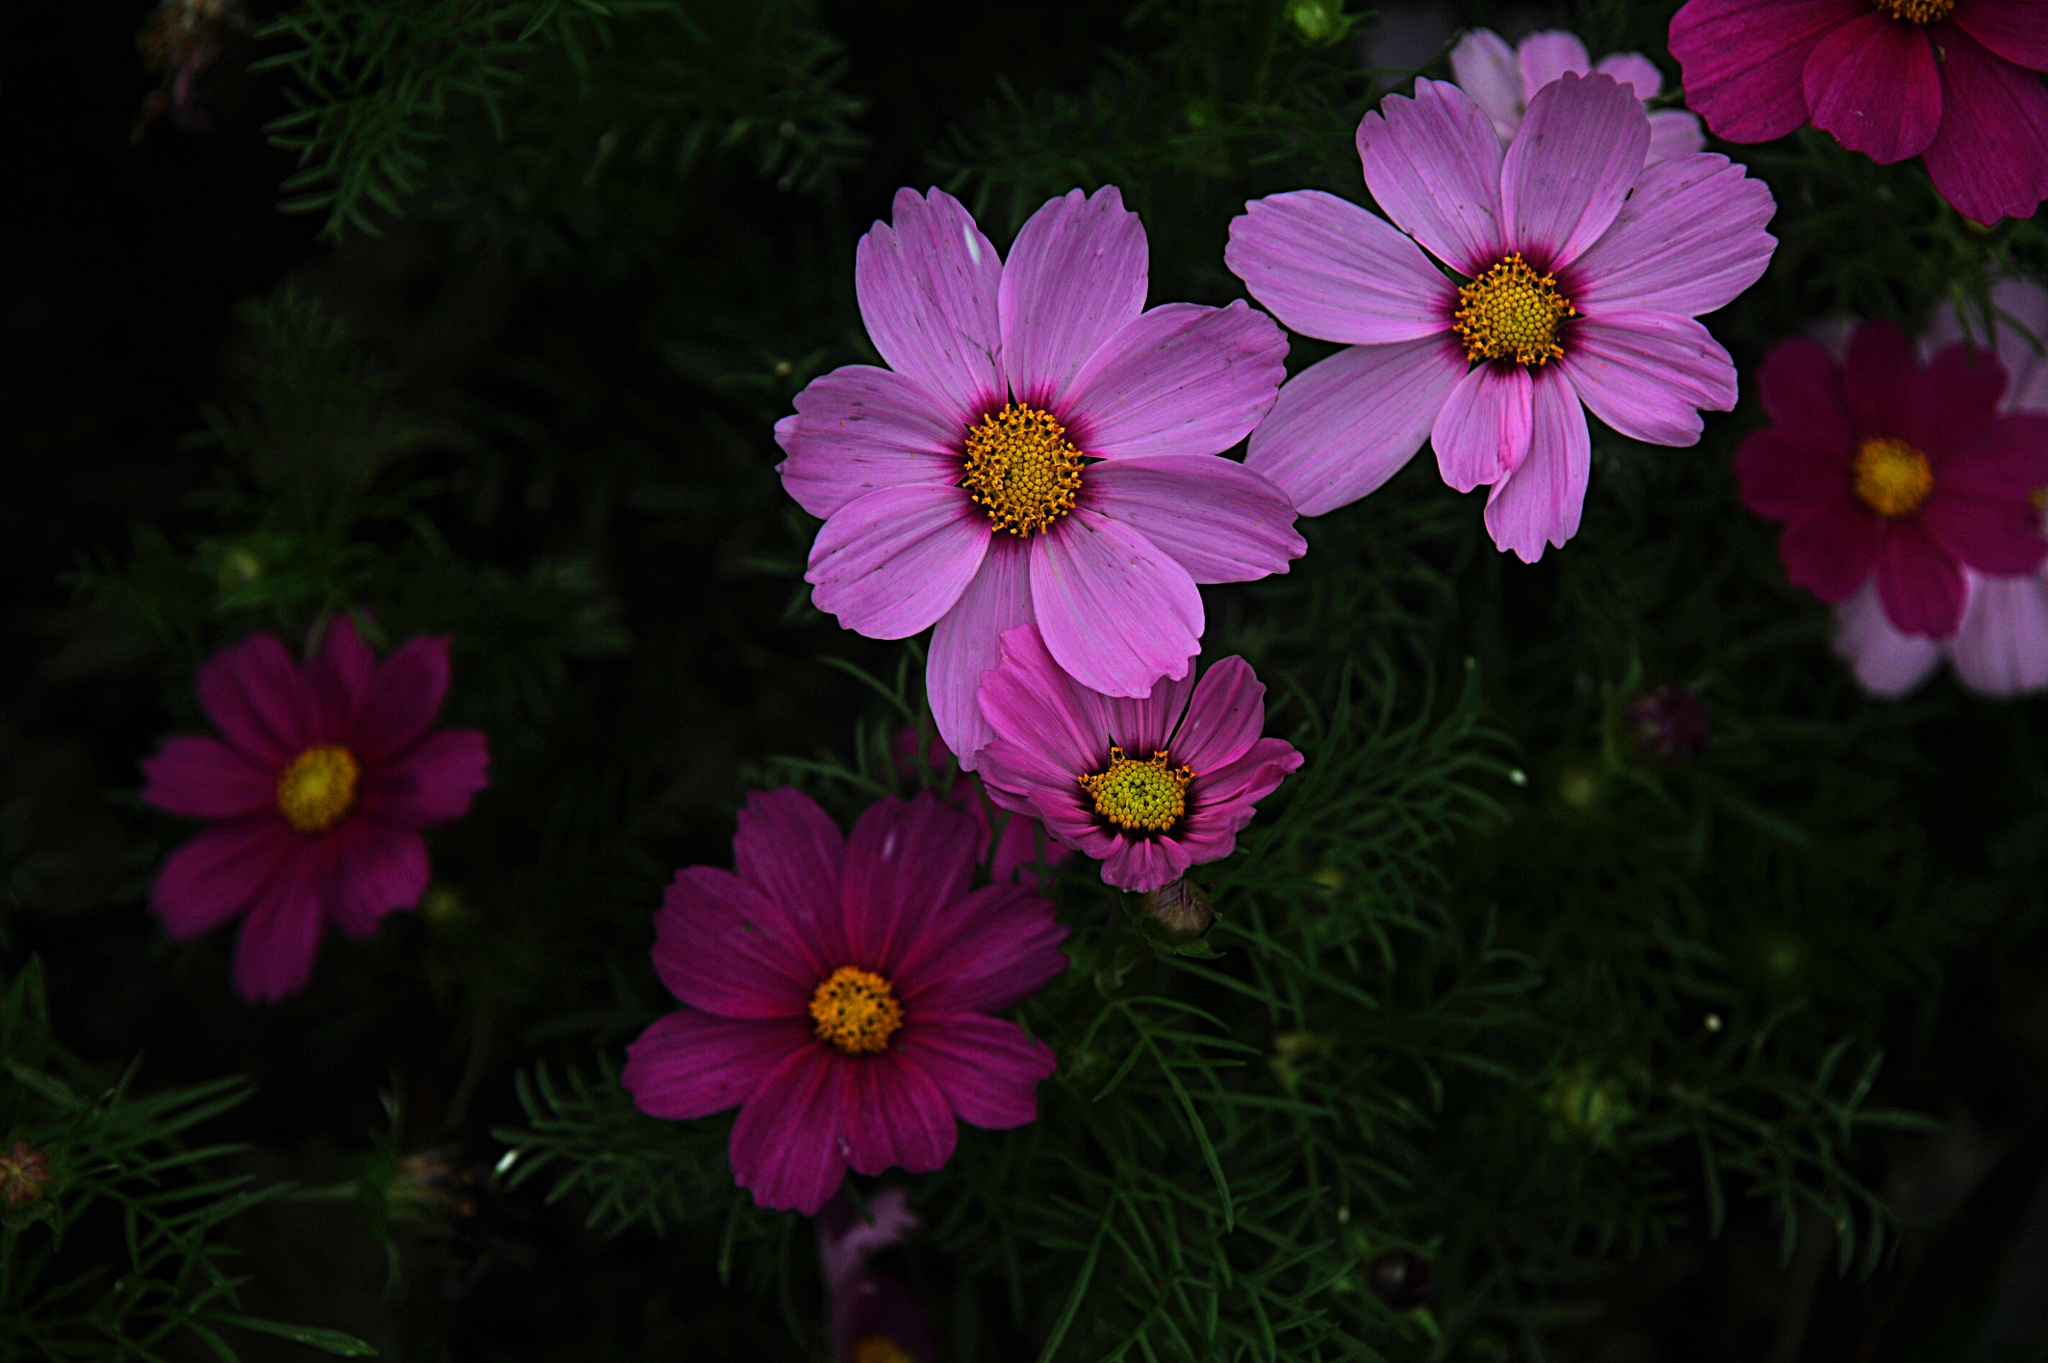 ...flowers at the 成都大熊猫繁育研究基地... by cyccanhk